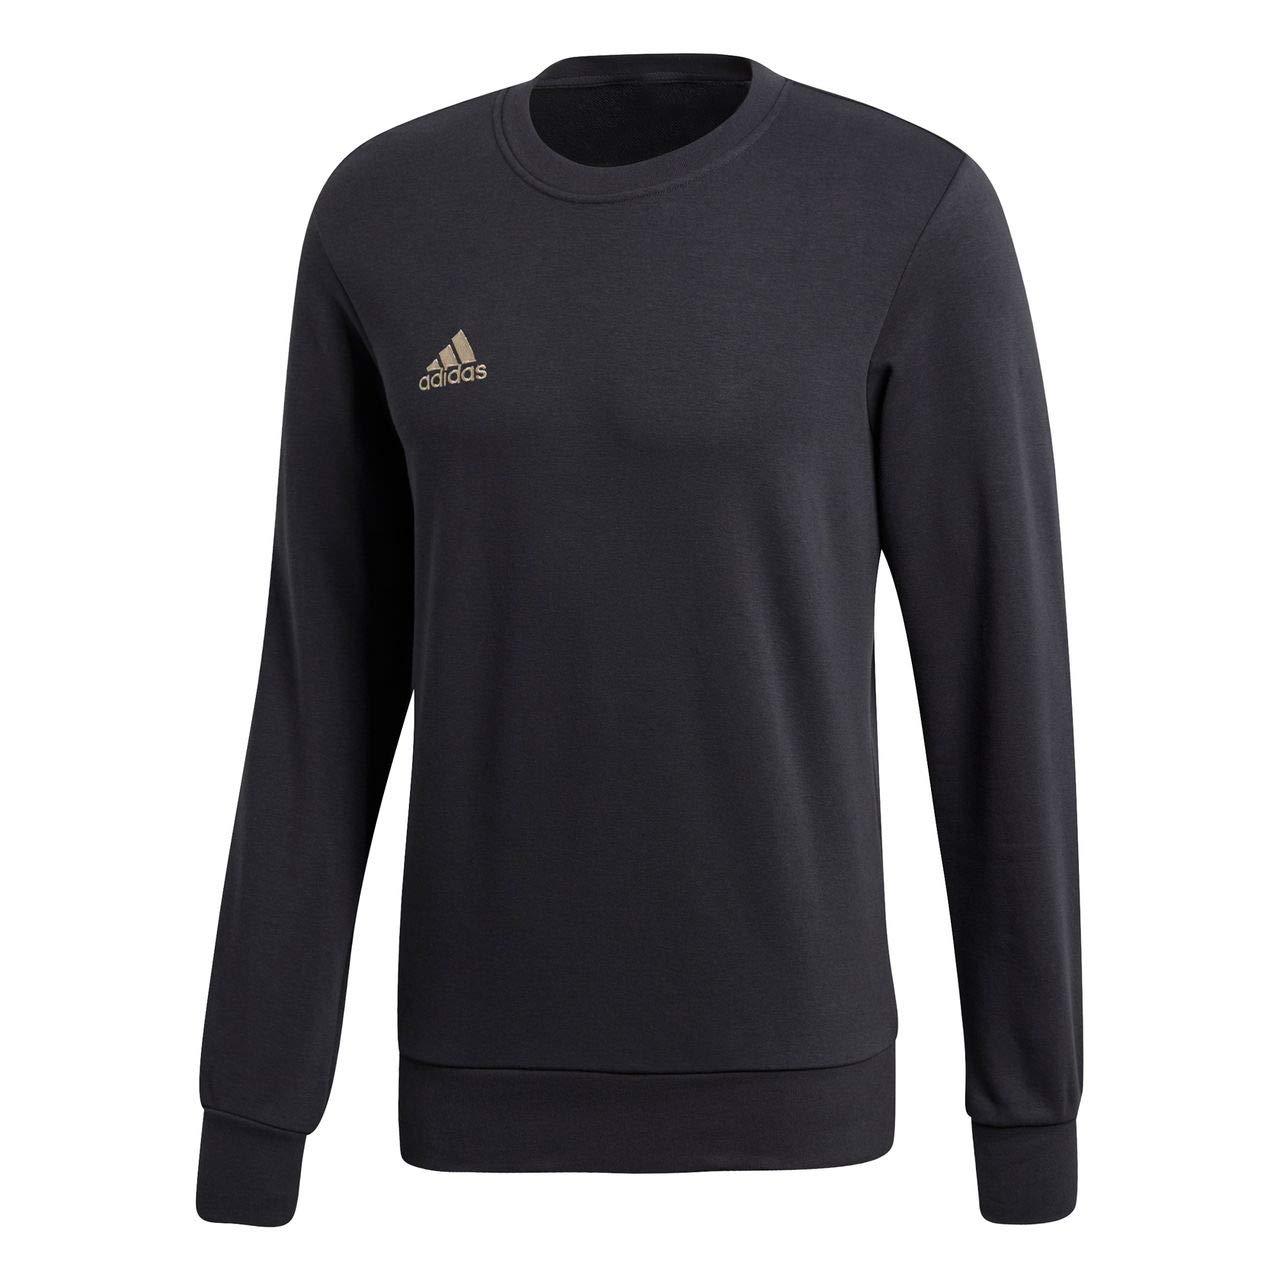 Adidas 2018-2019 Ajax Graphic Sweat Top (Carbon)